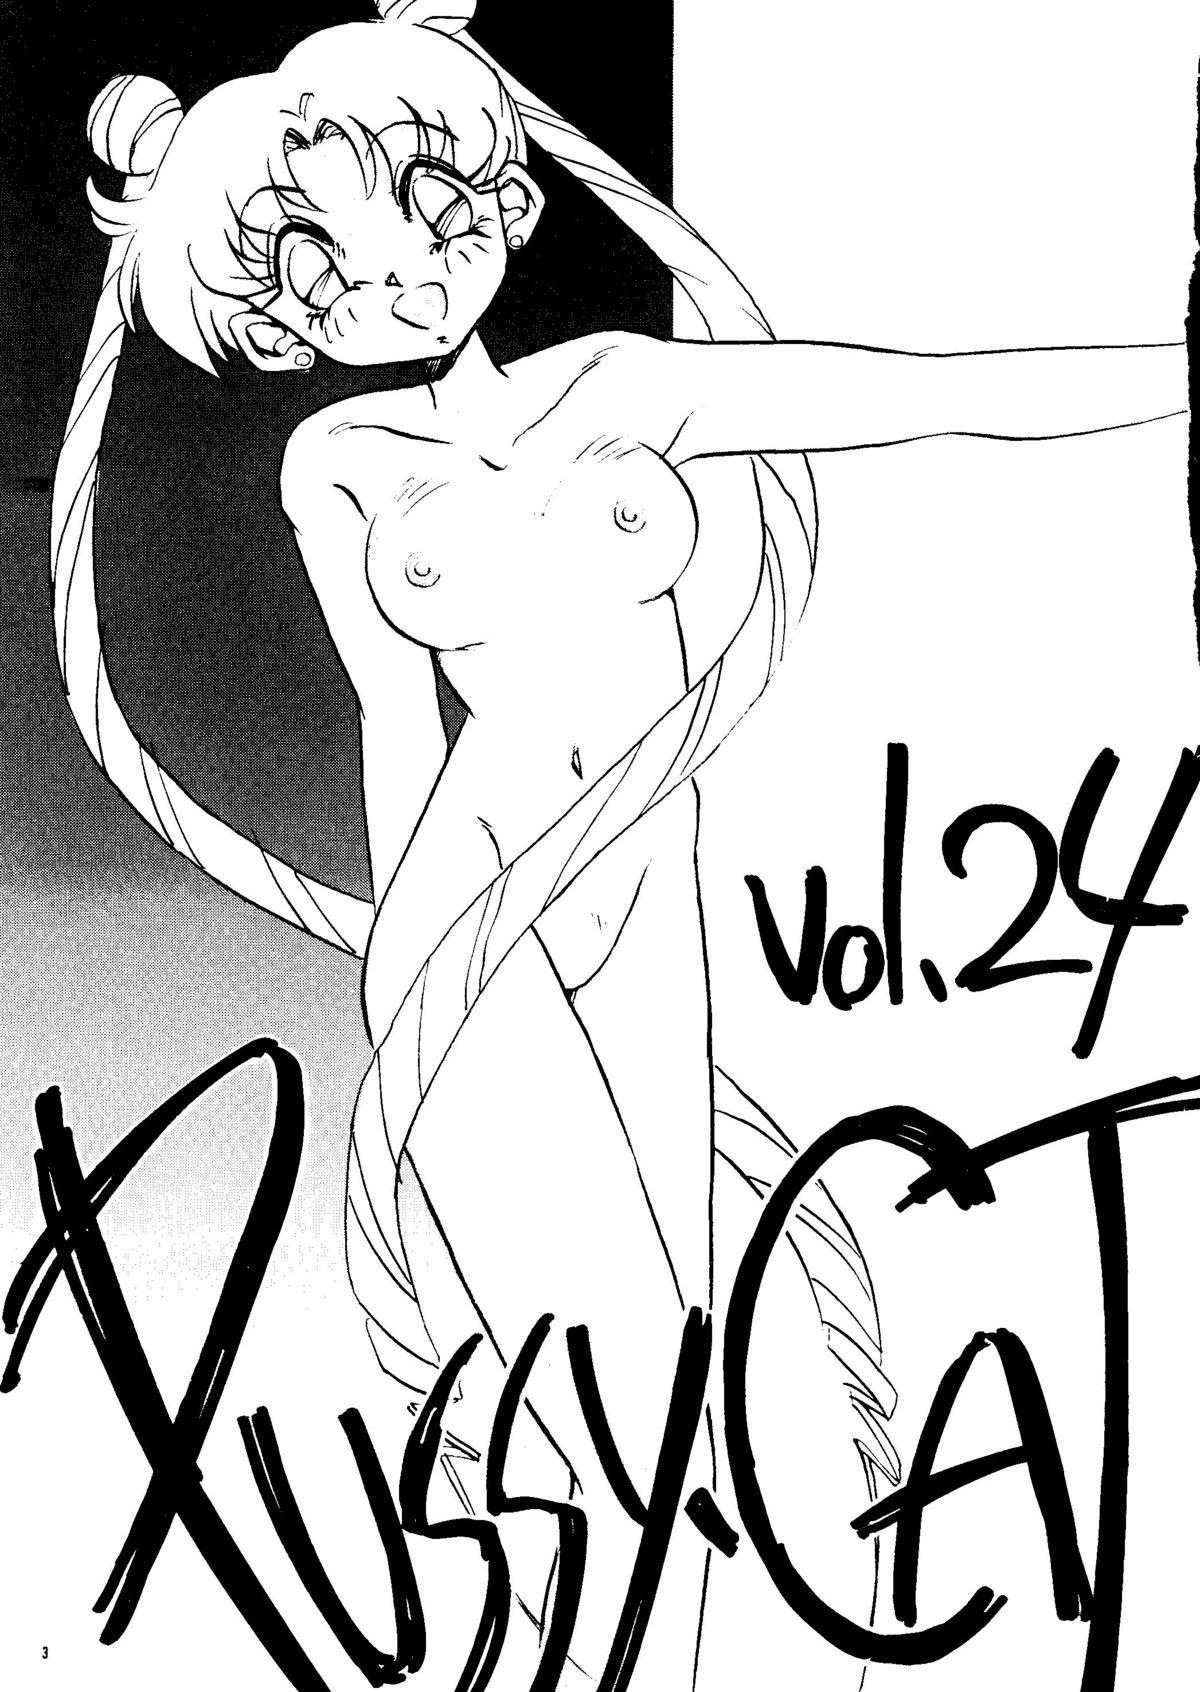 PUSSY-CAT Vol. 24 1